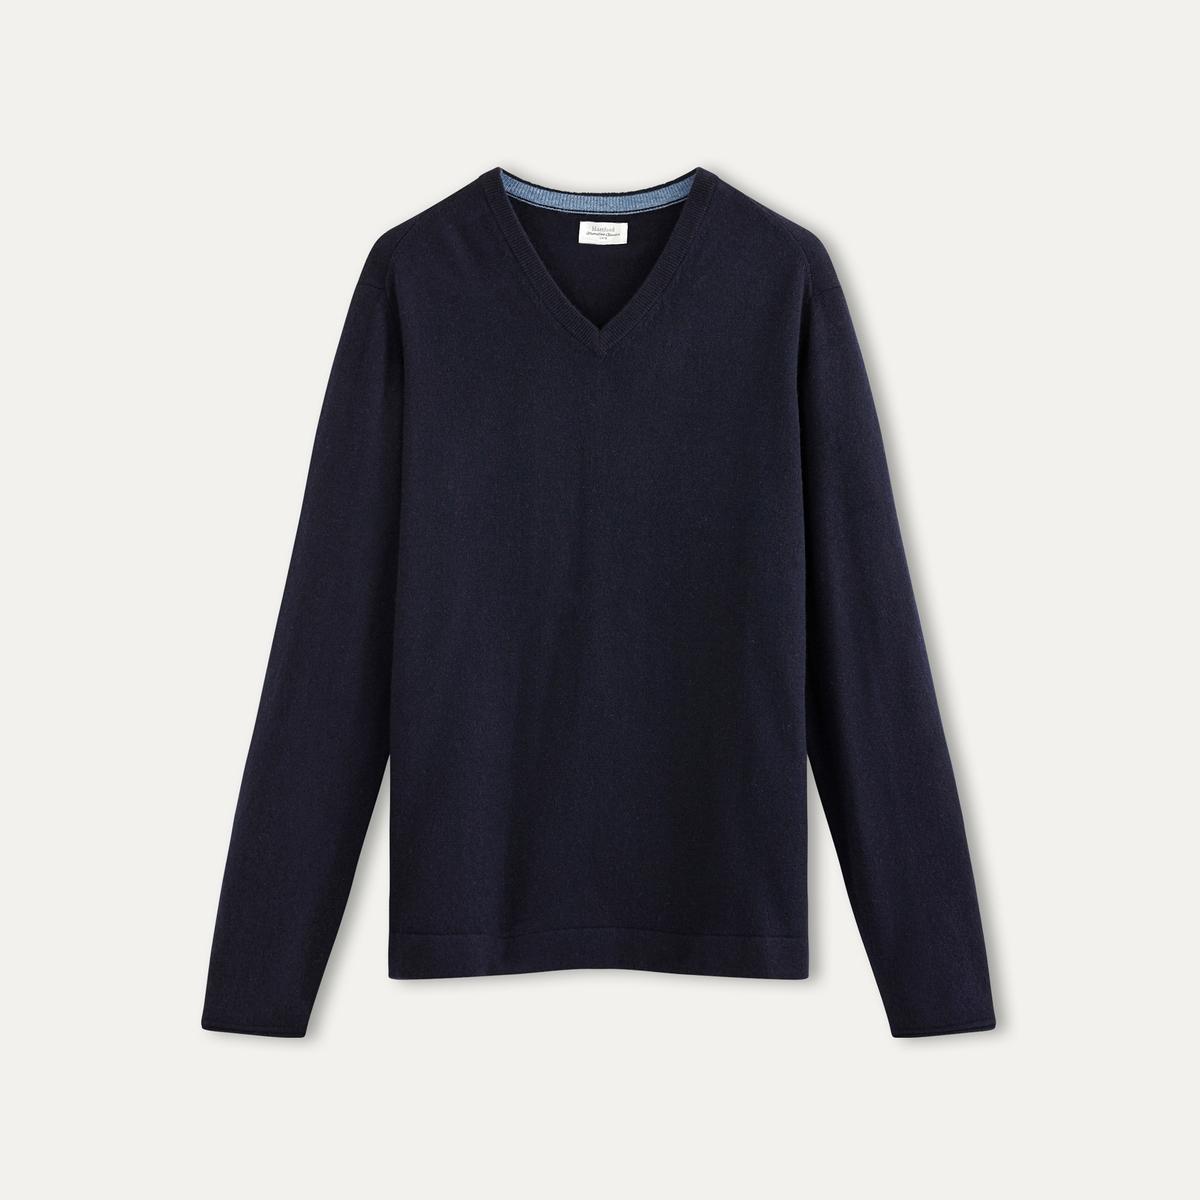 Пуловер из шерсти и кашемира от La Redoute